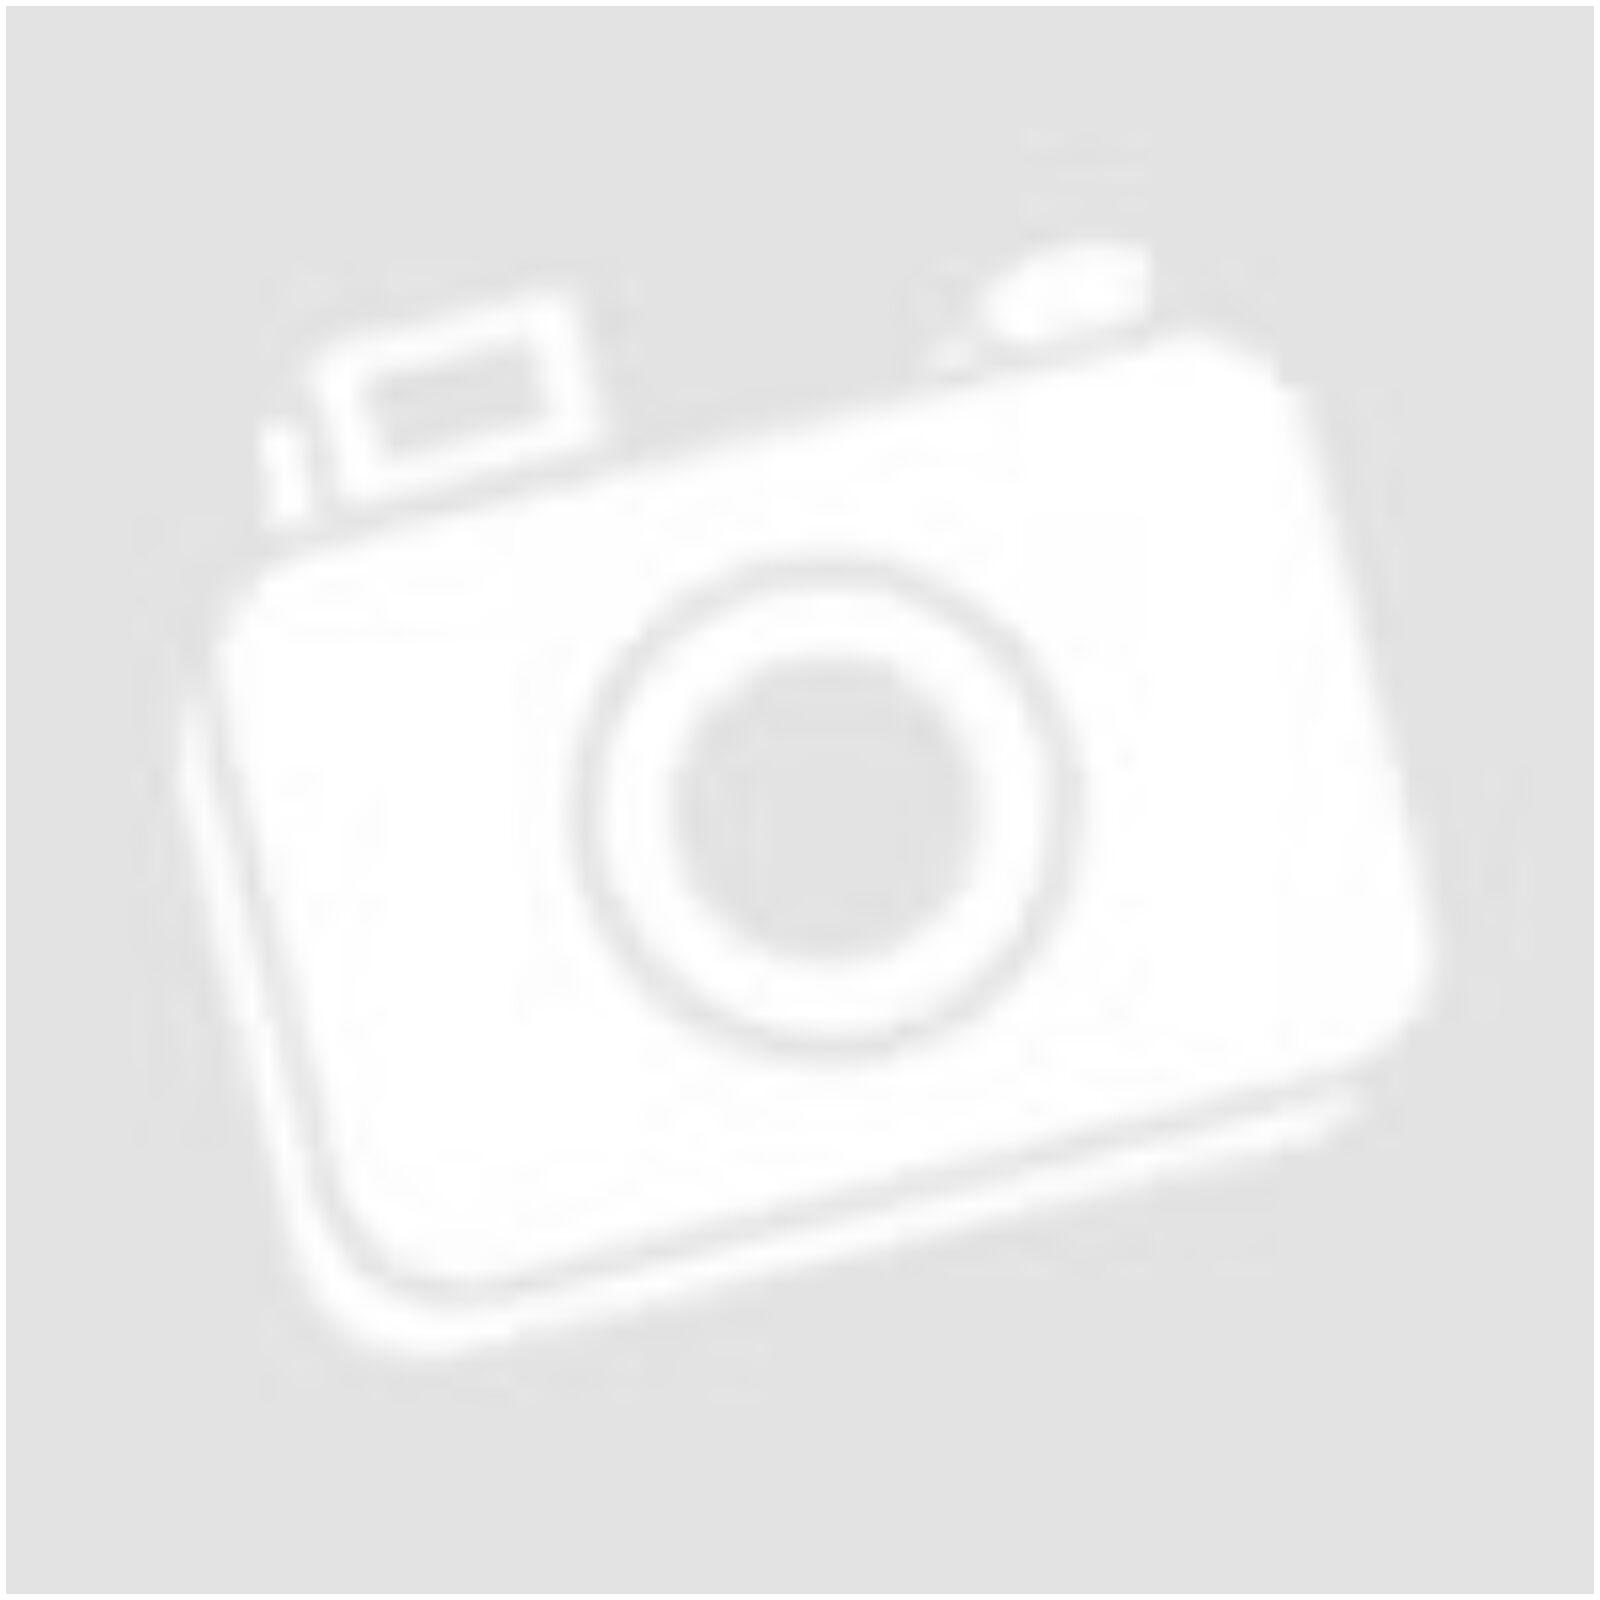 HARZO-Pw 100 prémium fal alapozó [1 l]